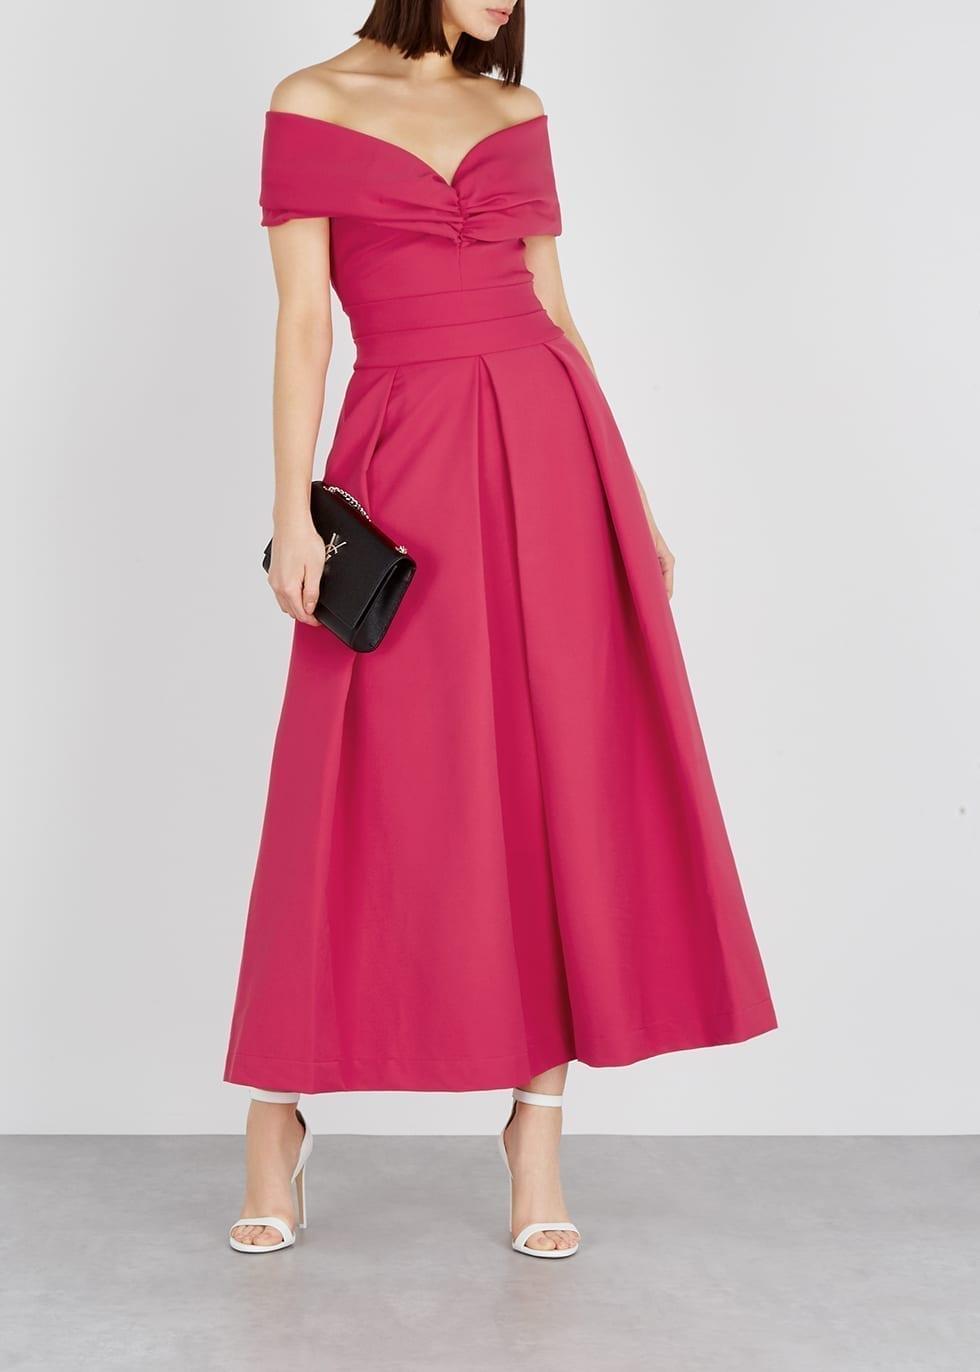 PREEN BY THORNTON BREGAZZI Daniela Ruched Maxi Pink Dress